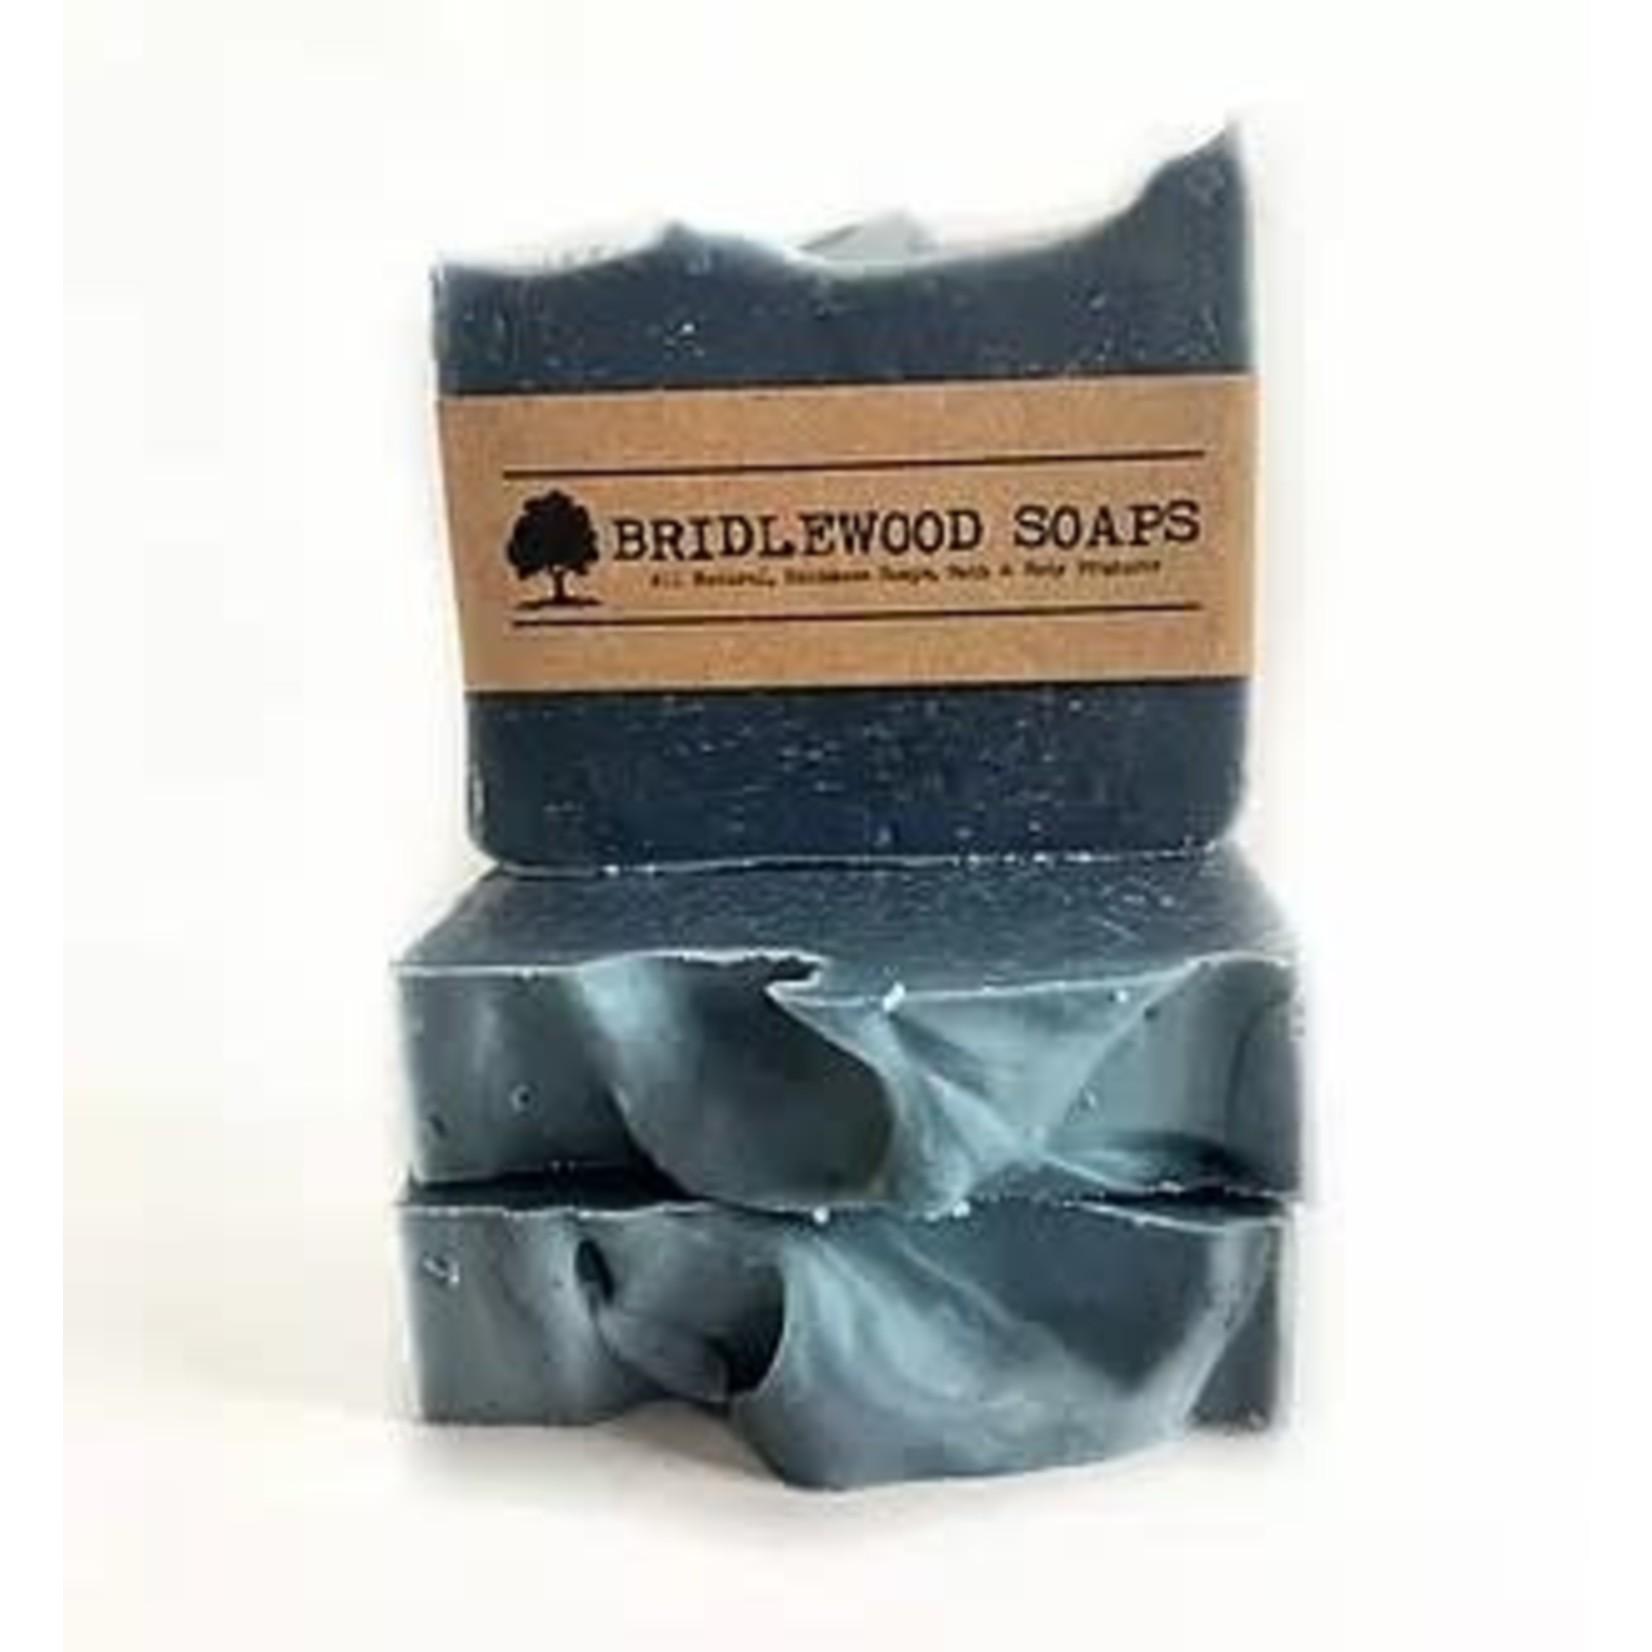 Bridlewood Soaps Inigo Soap